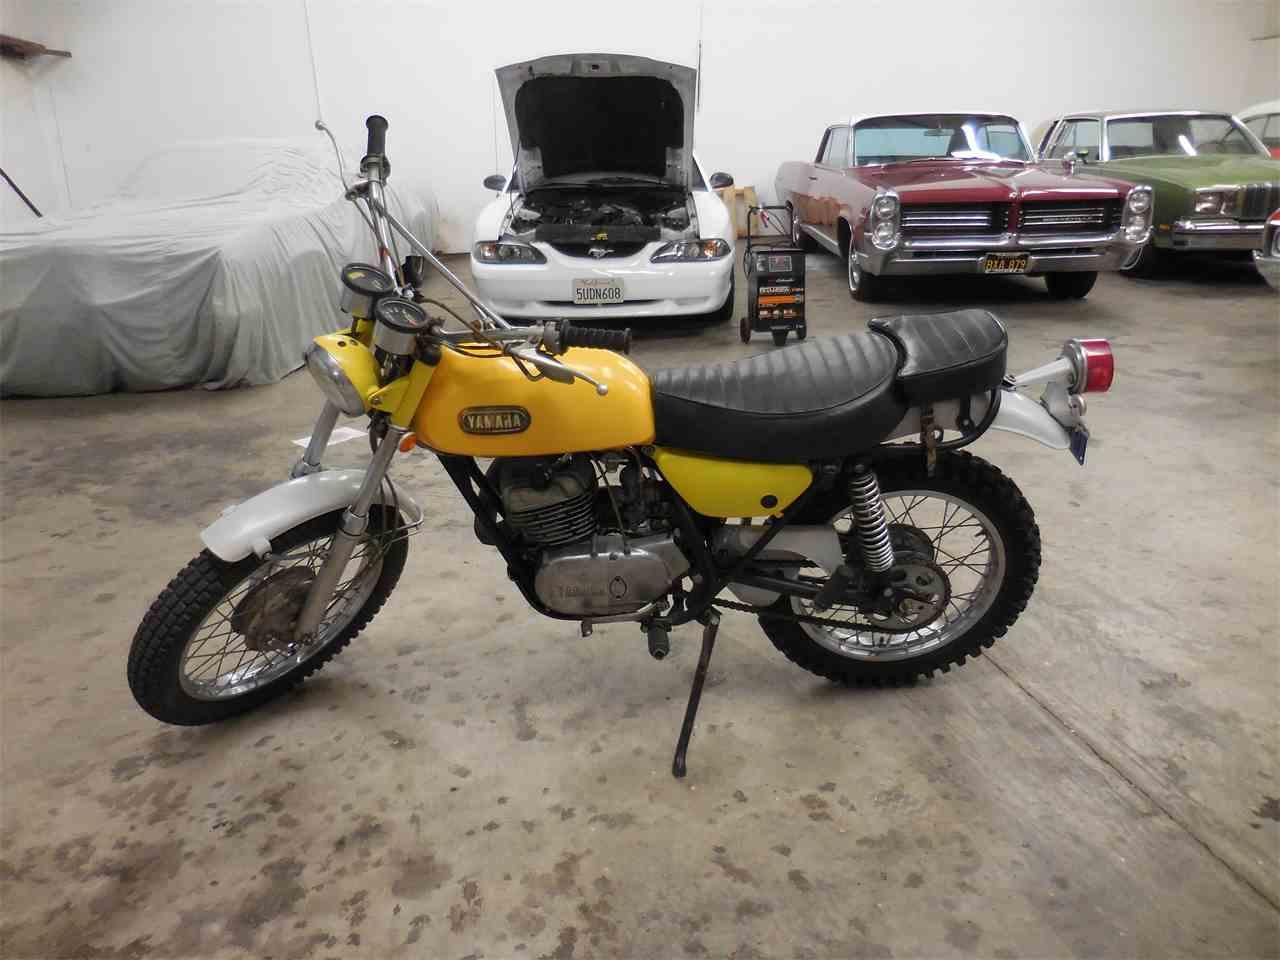 1971 yamaha dt1 250 for sale cc 971010 for Yamaha dt 250 for sale